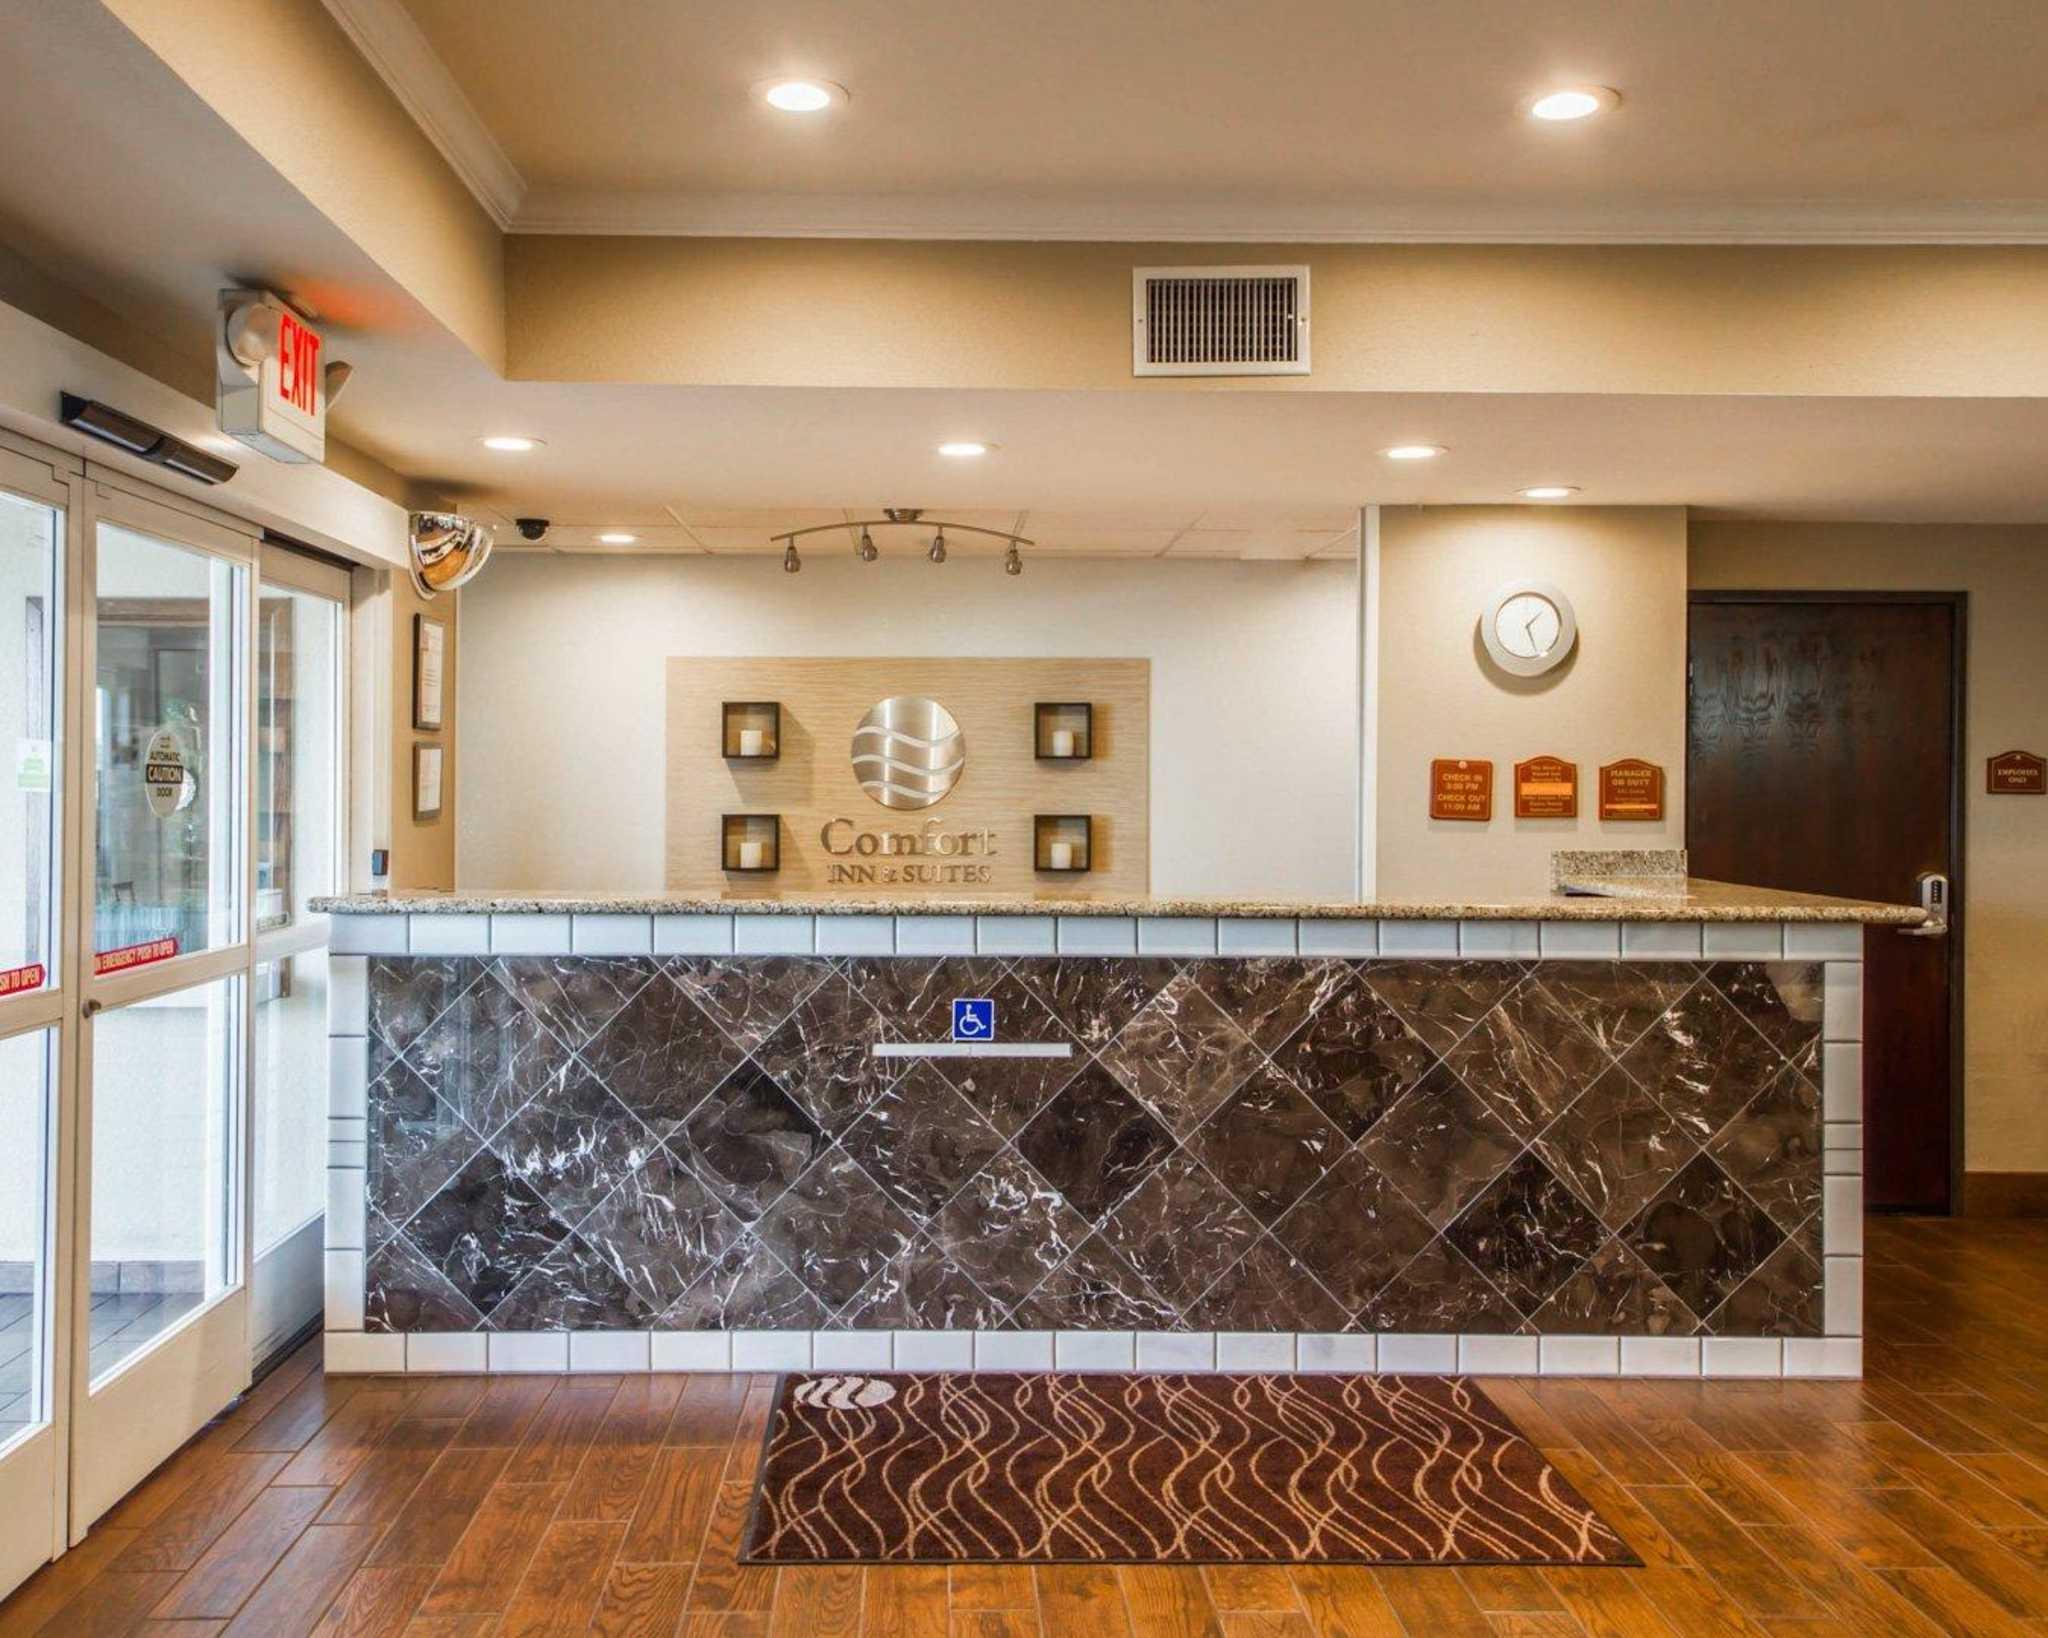 Comfort Inn & Suites Sacramento - University Area image 5